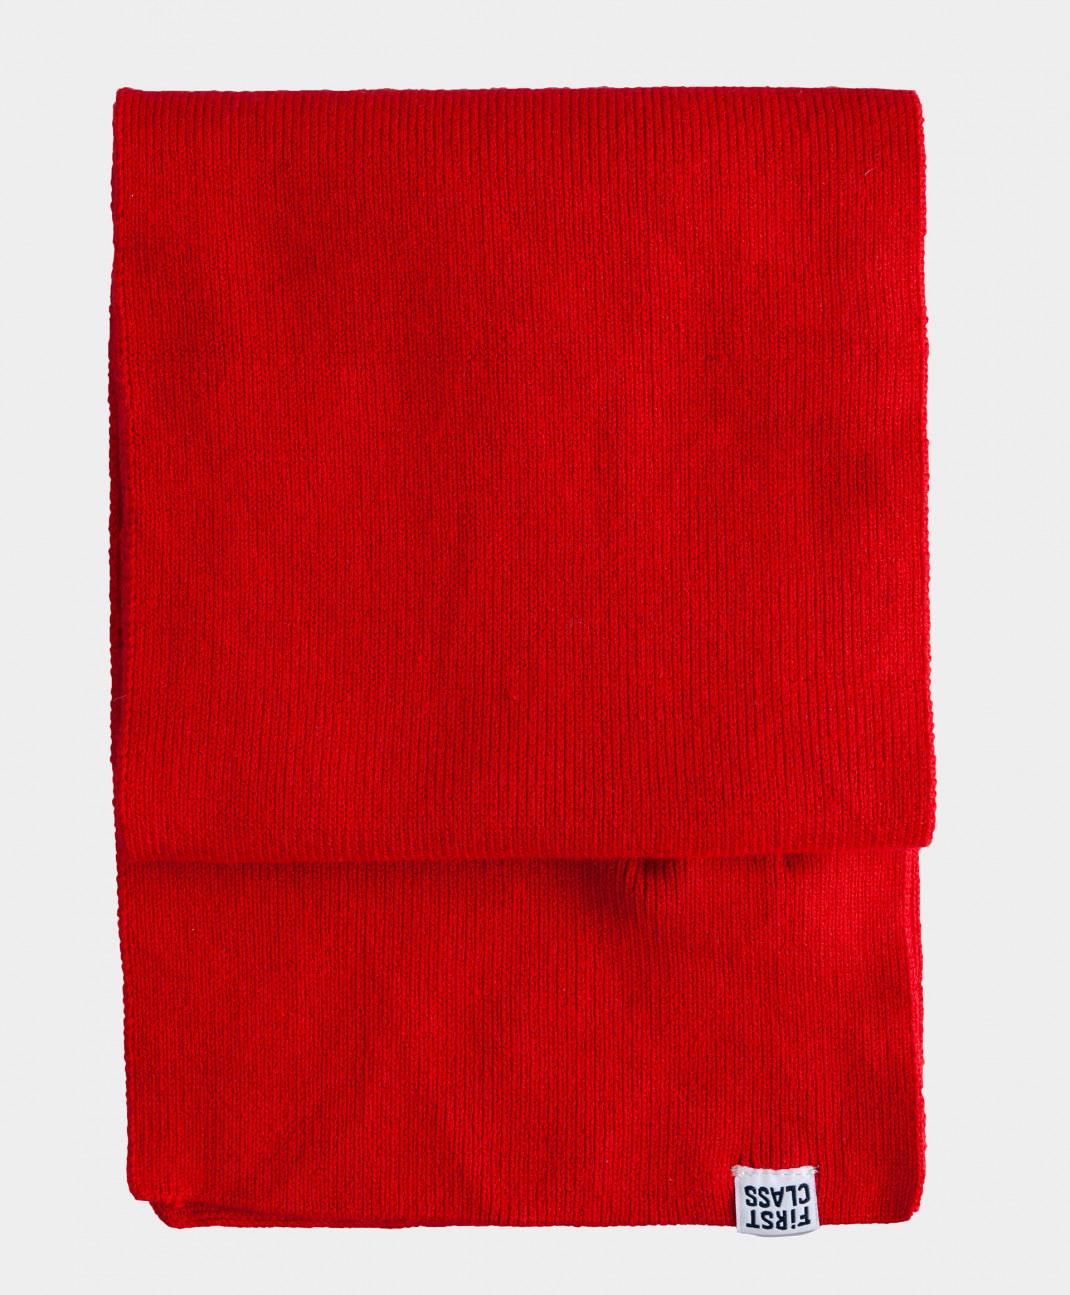 шарф gulliver gulliver gu015gbbtwk5 Gulliver Красный шарф вязаный Gulliver